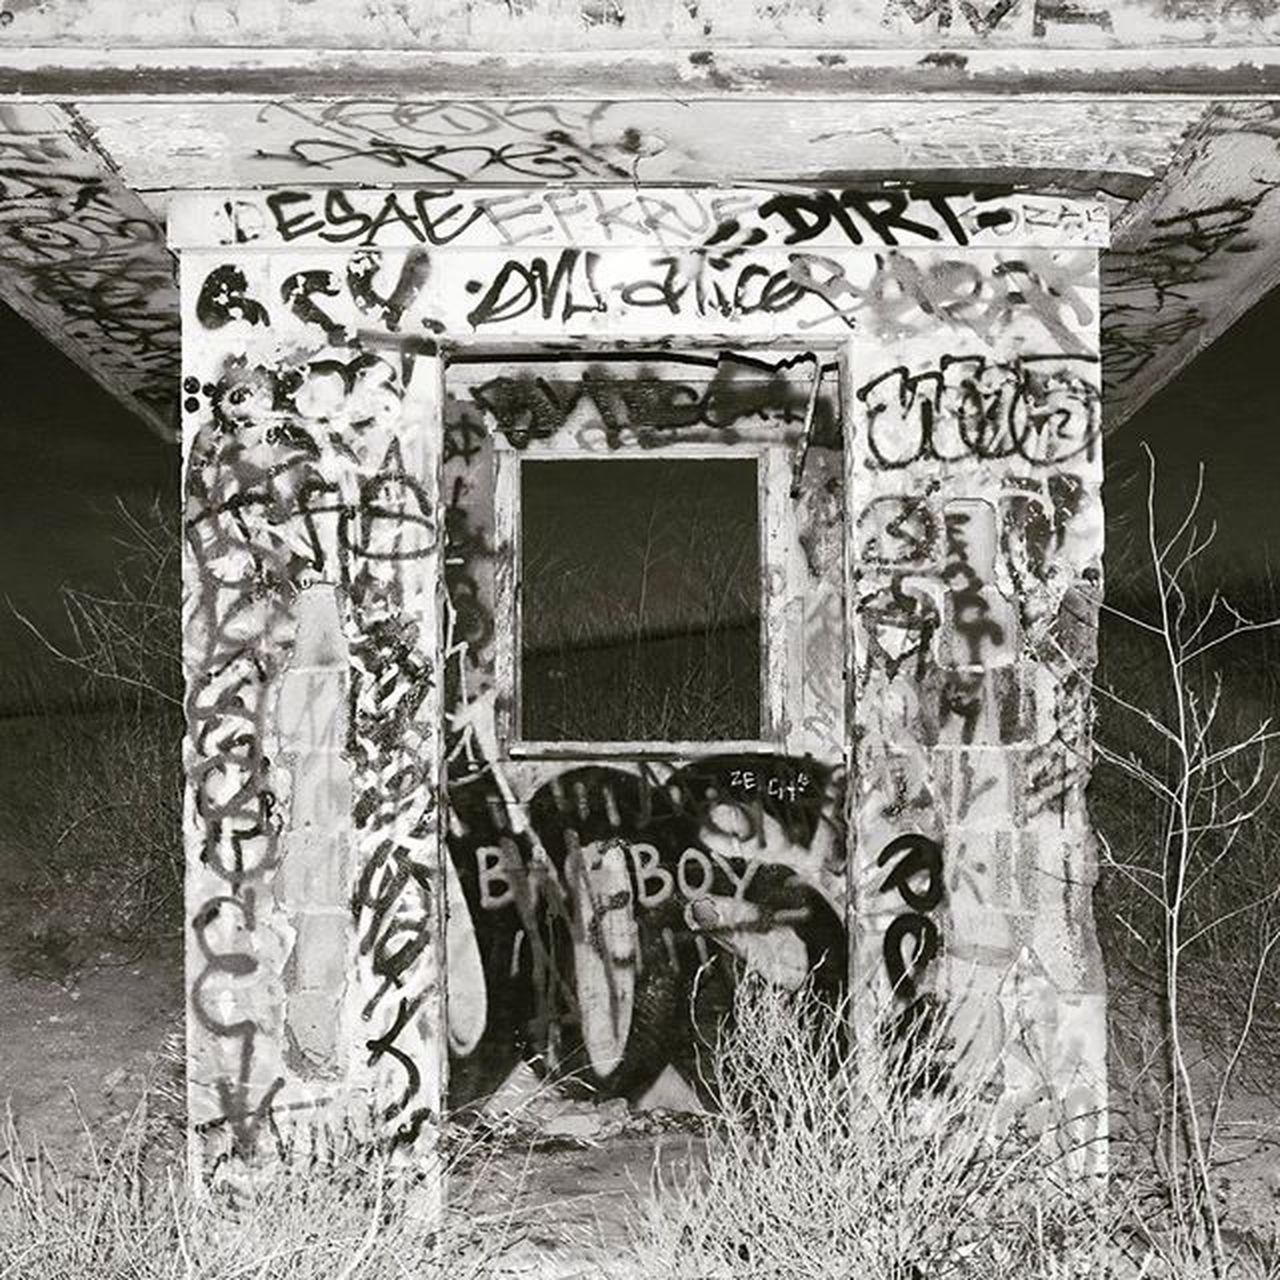 *beauty is in the eye of the beholder* Graffiti Art Graffitiart Vantagepoint Latergram Pentaxk50 Pentax Pentaxcamera Pentaxiansunite Pentaxiansstandup Pentaxagram Blackandwhitephotography